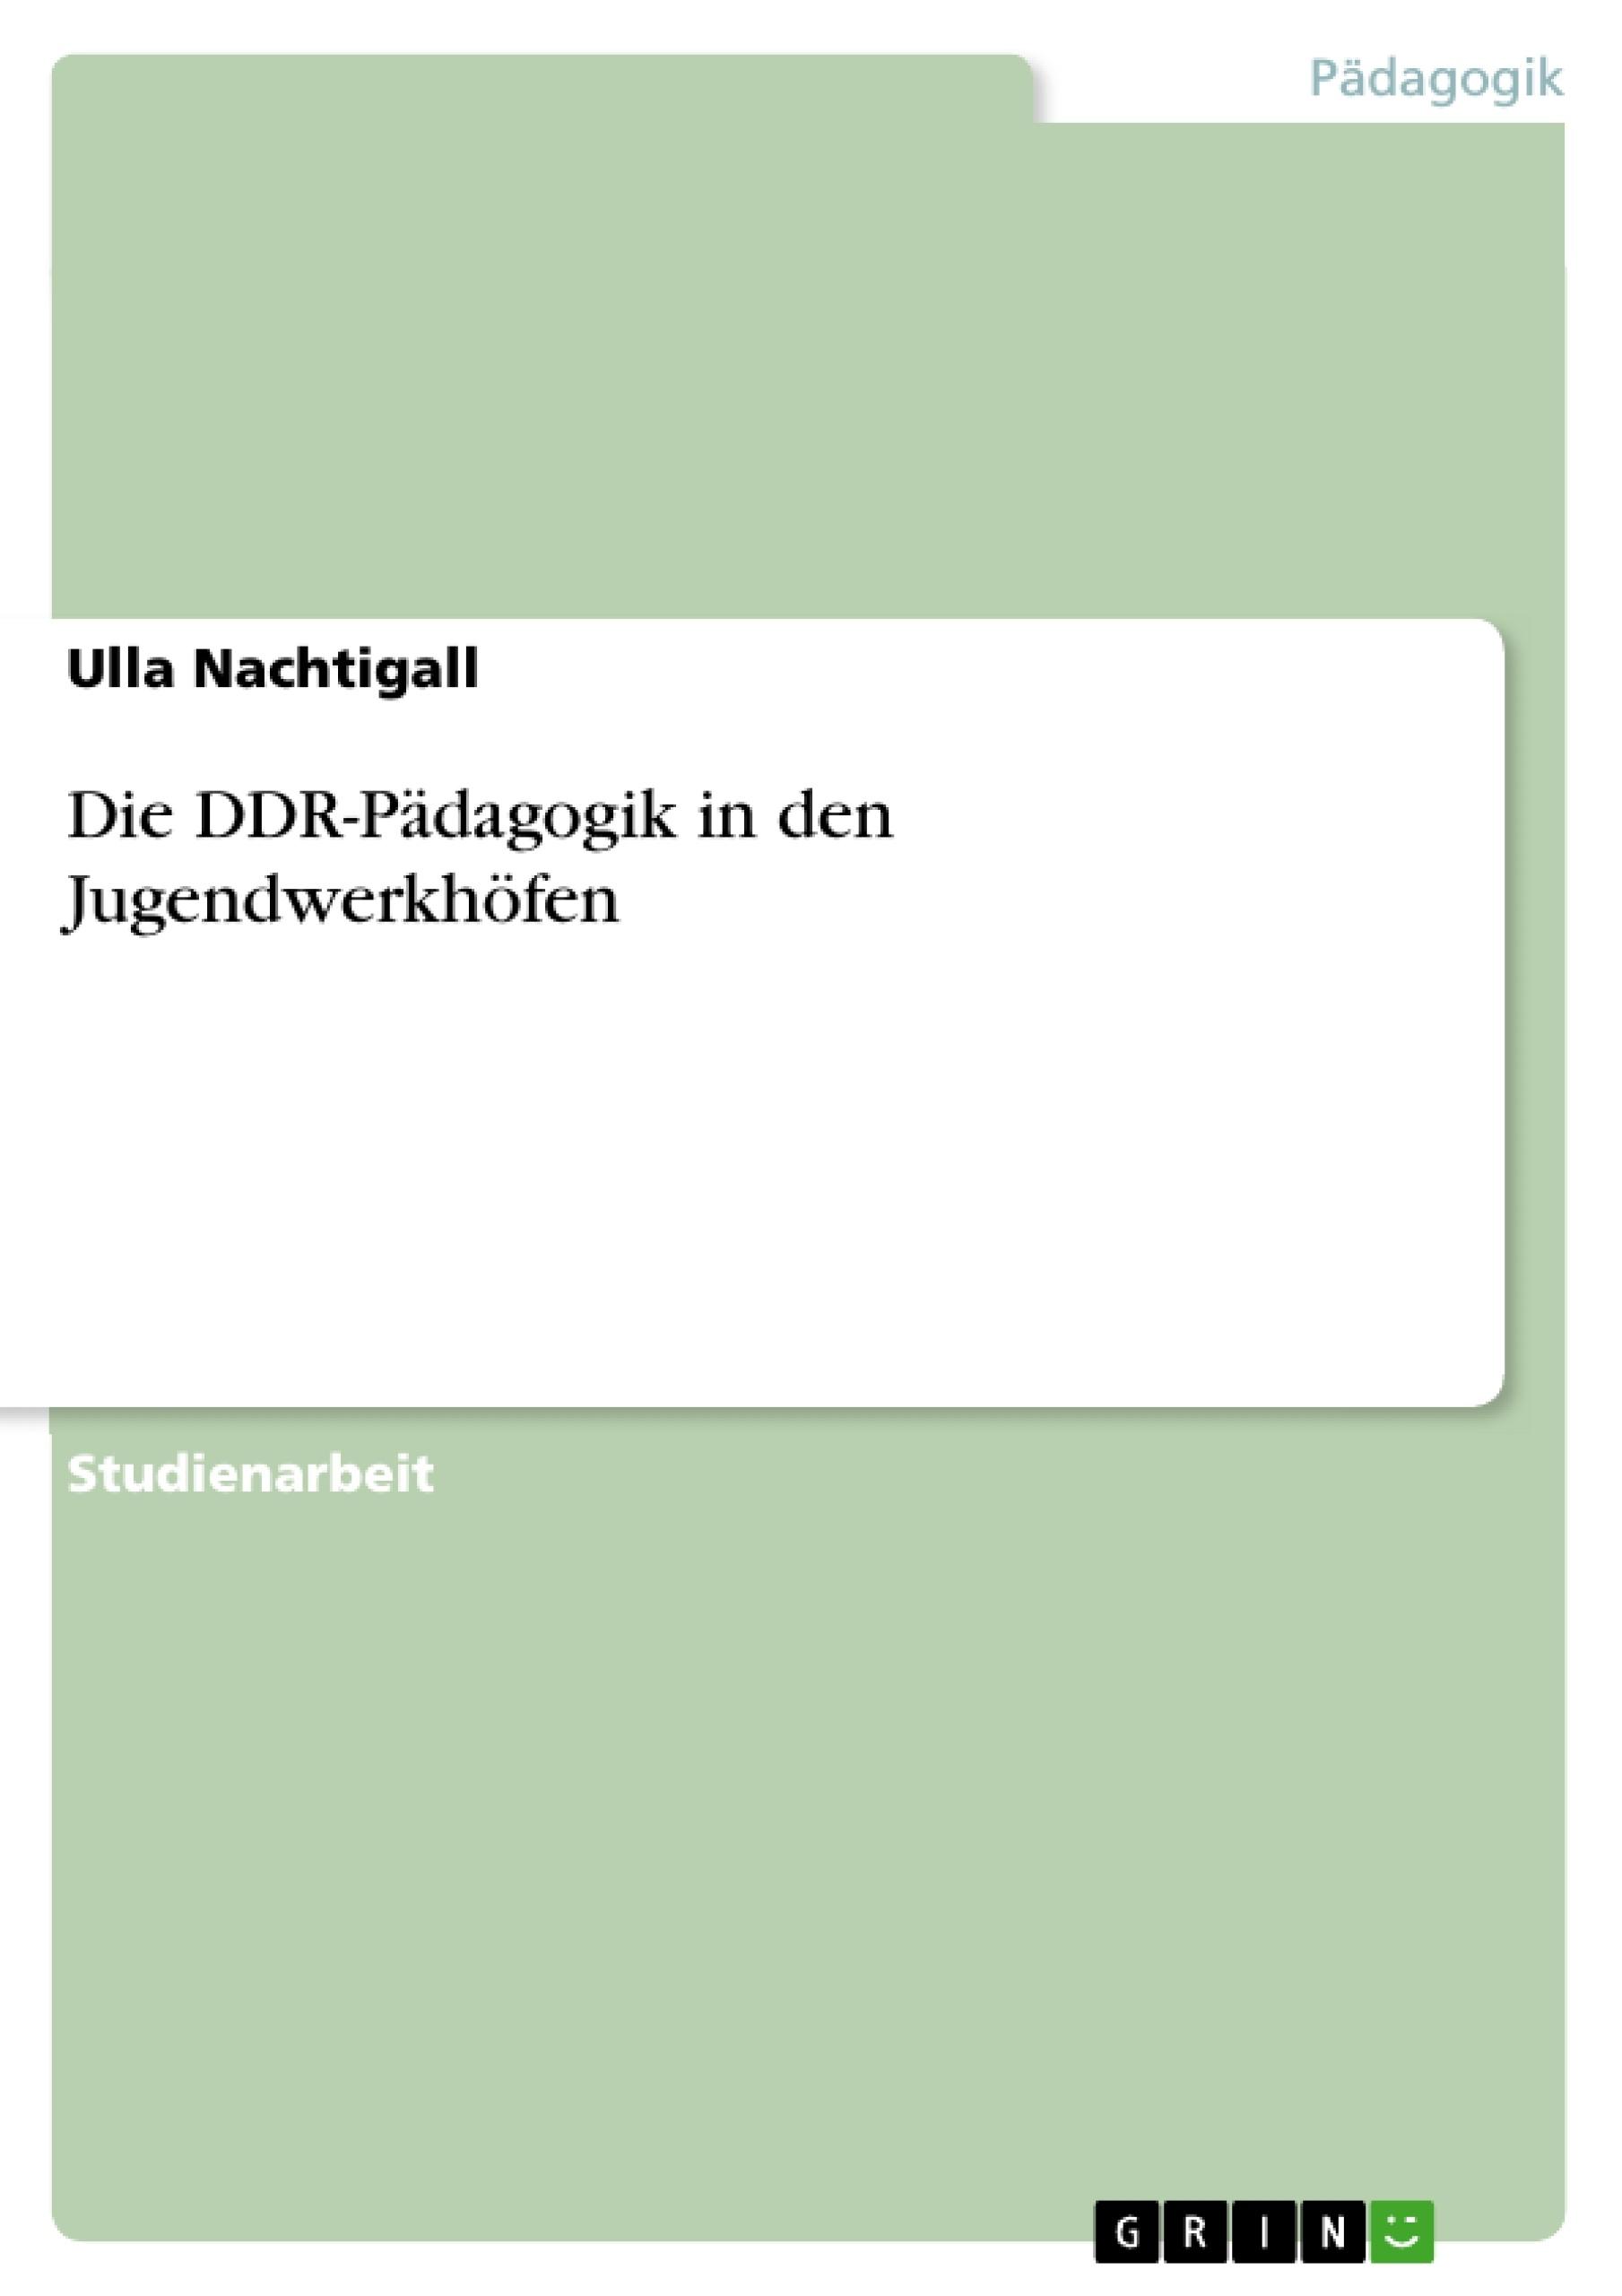 Titel: Die DDR-Pädagogik in den Jugendwerkhöfen